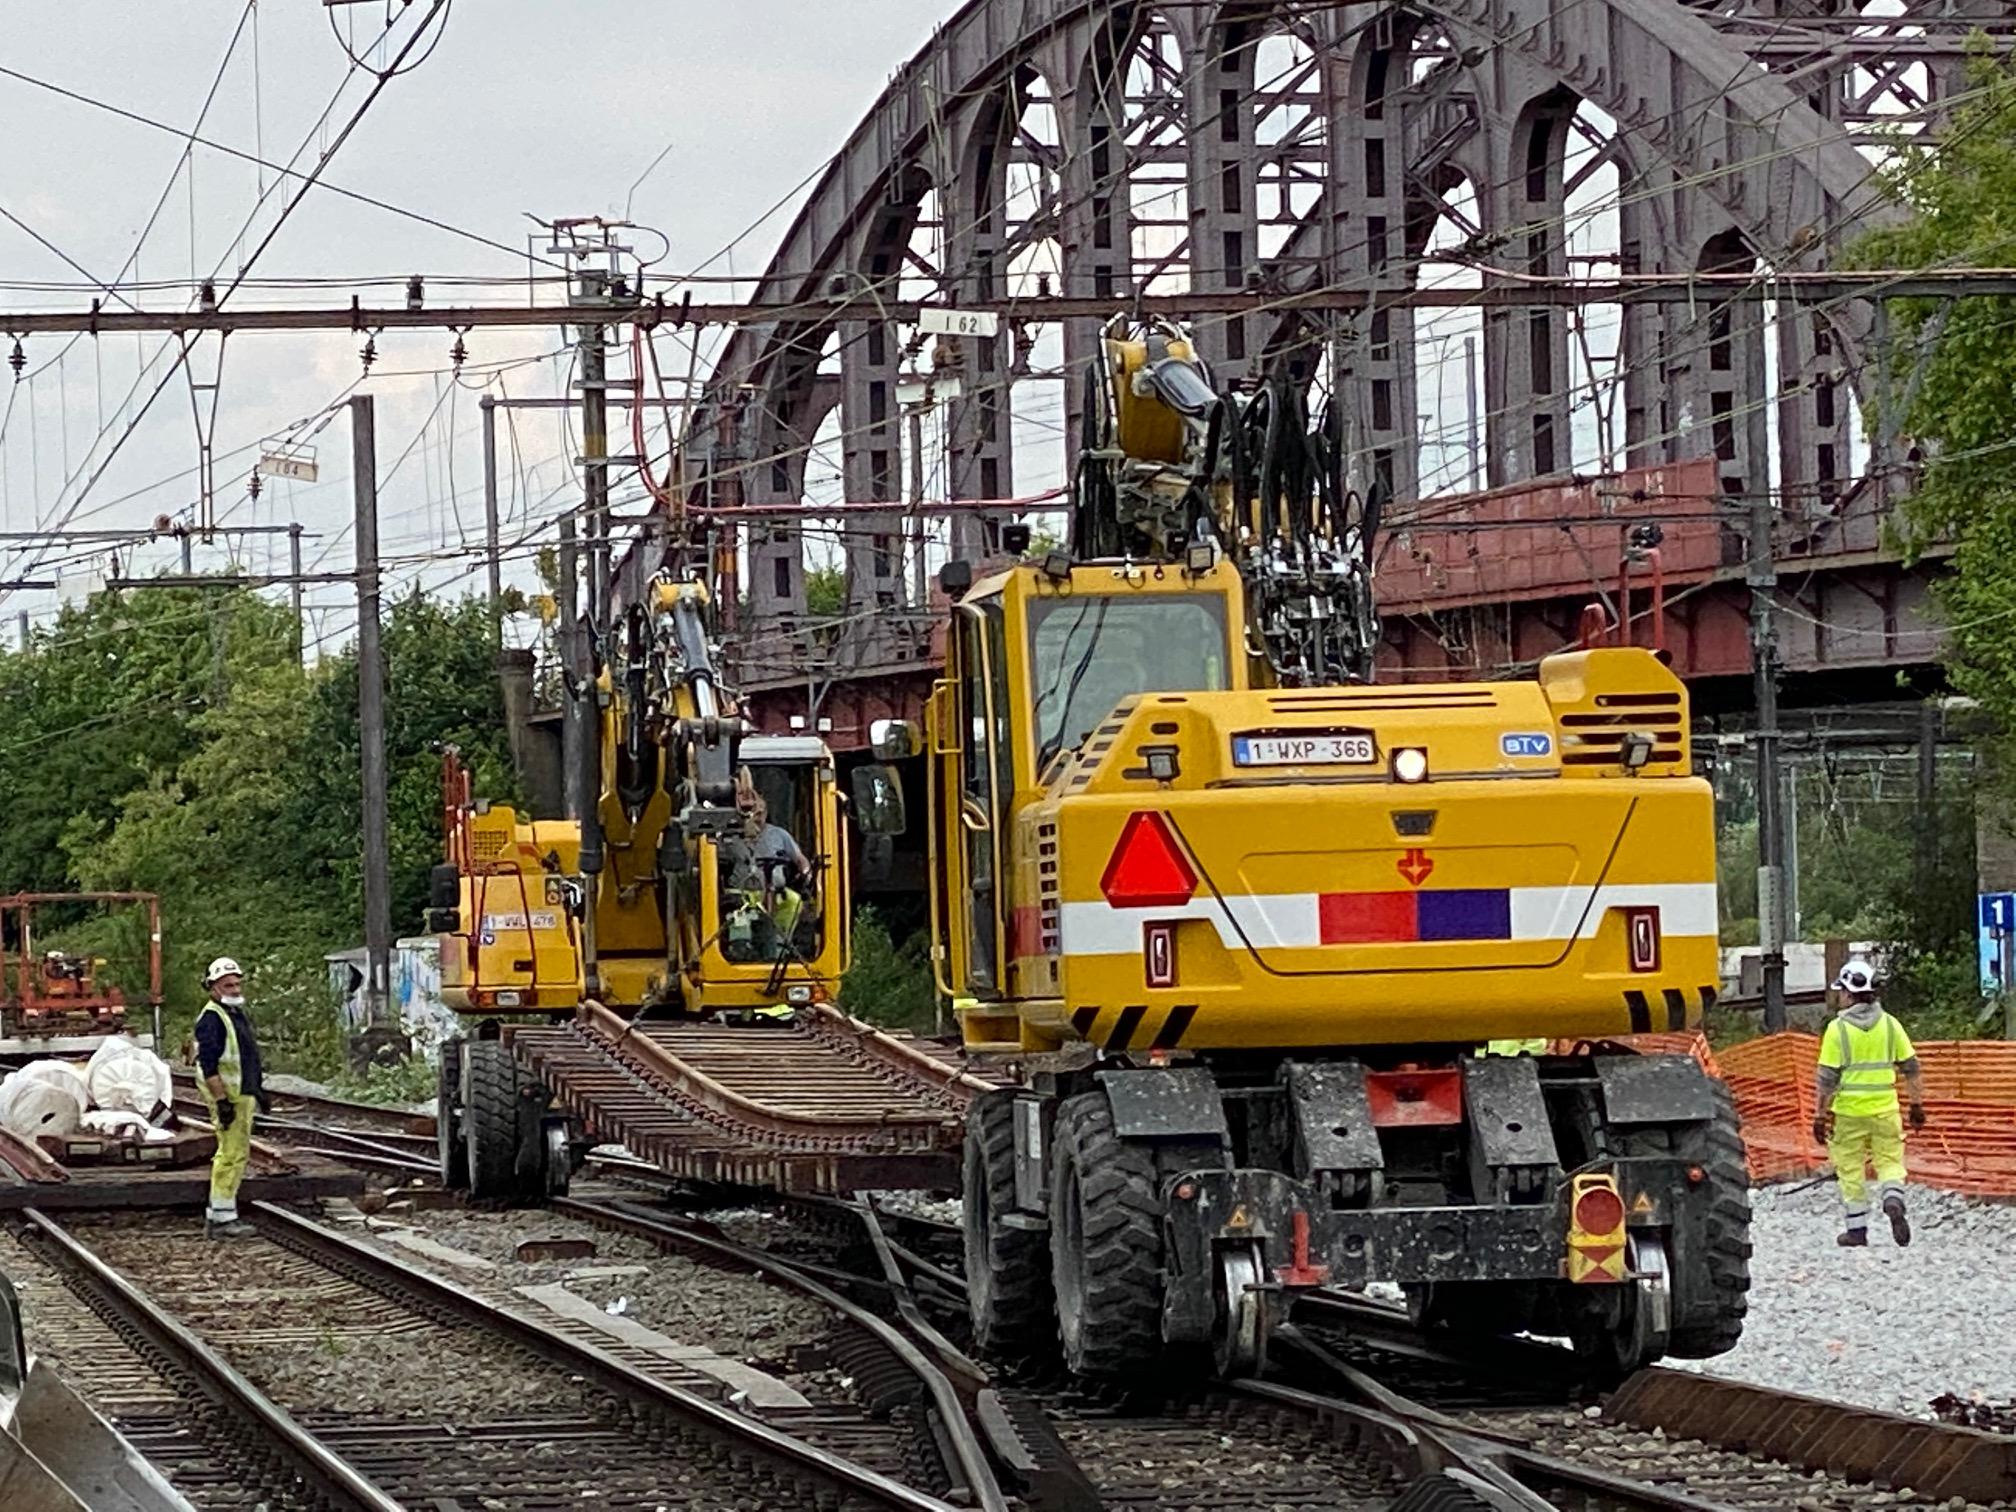 Wisselvernieuwing_Station Mechelen_2